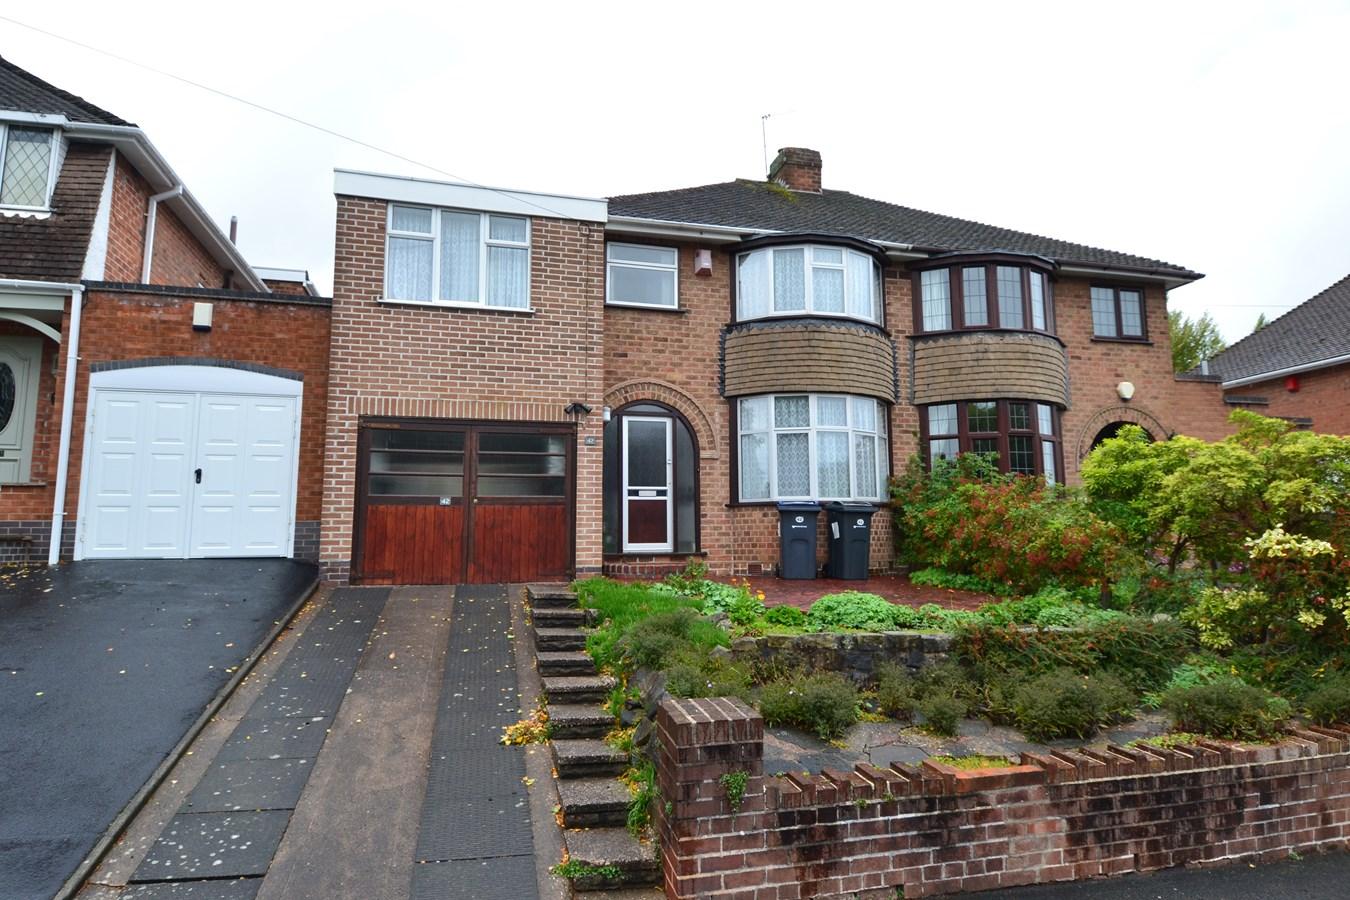 4 Bedroom Property For Sale In Aversley Road Kings Norton Birmingham B38 Offers In The Region Of 279950